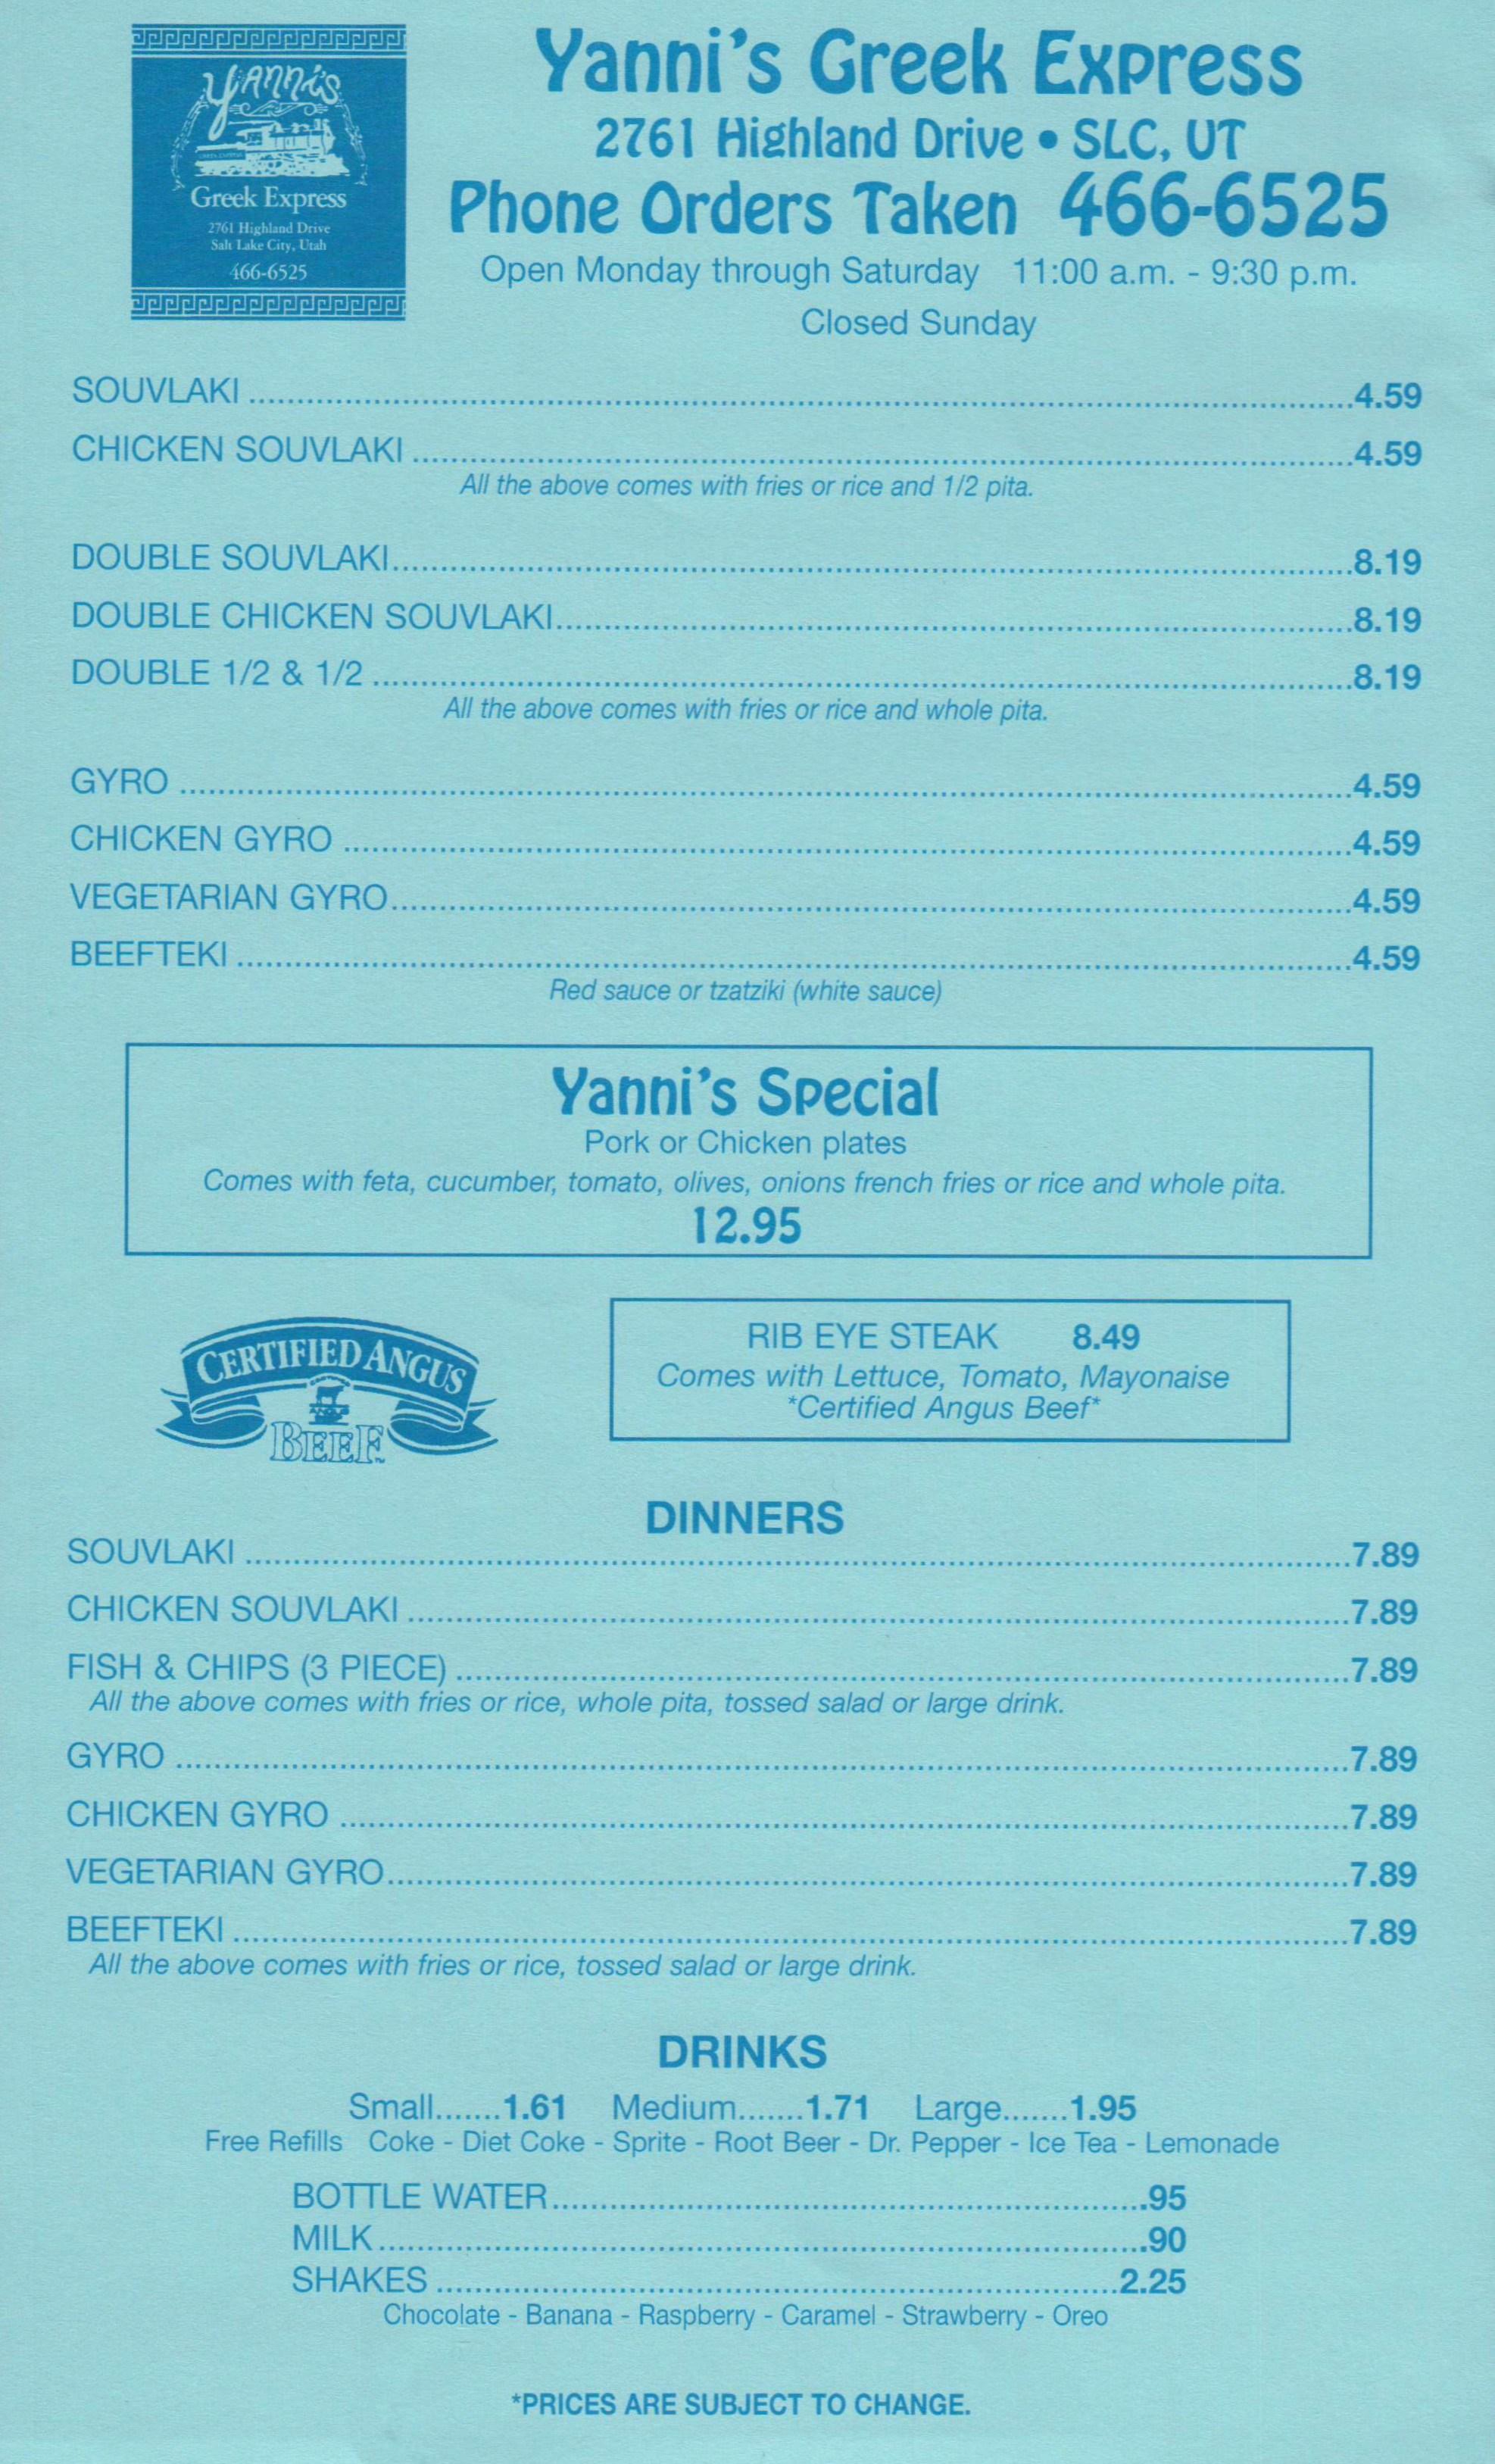 Yanni's Greek Express menu - dinners, gyro, souvlaki